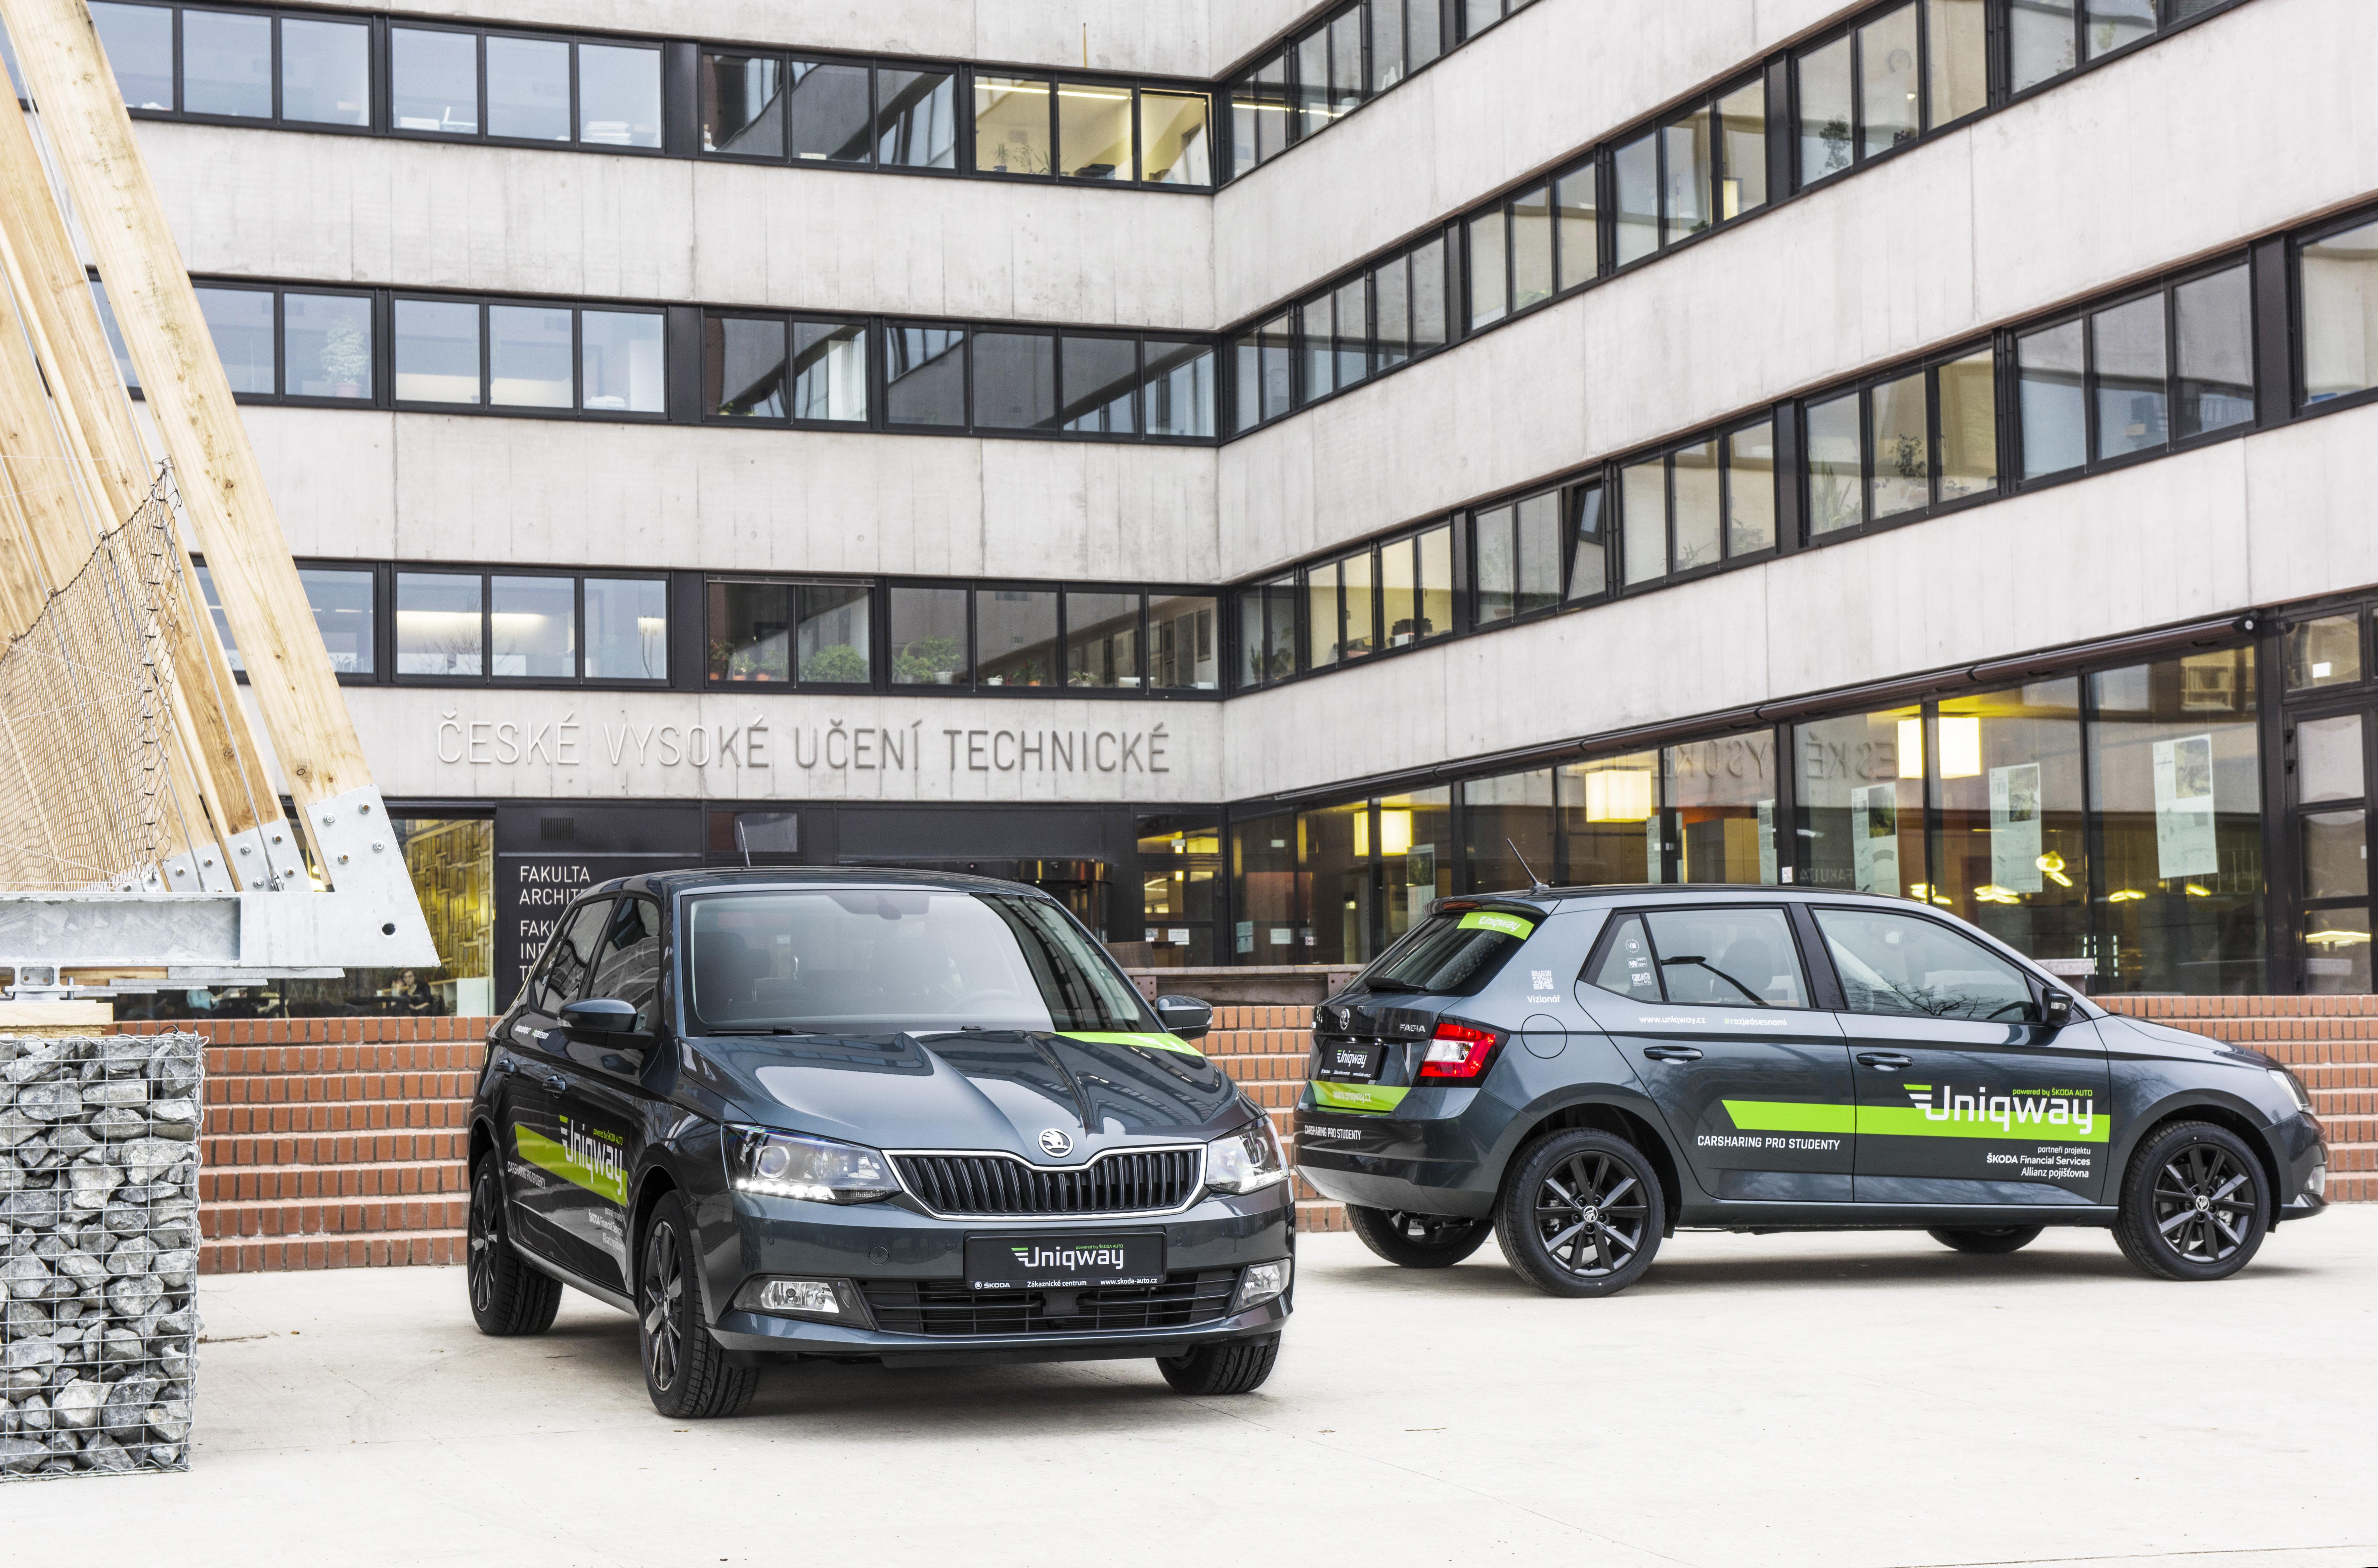 Skoda Auto Launches Car Sharing Platform Uniqway Skoda Storyboard